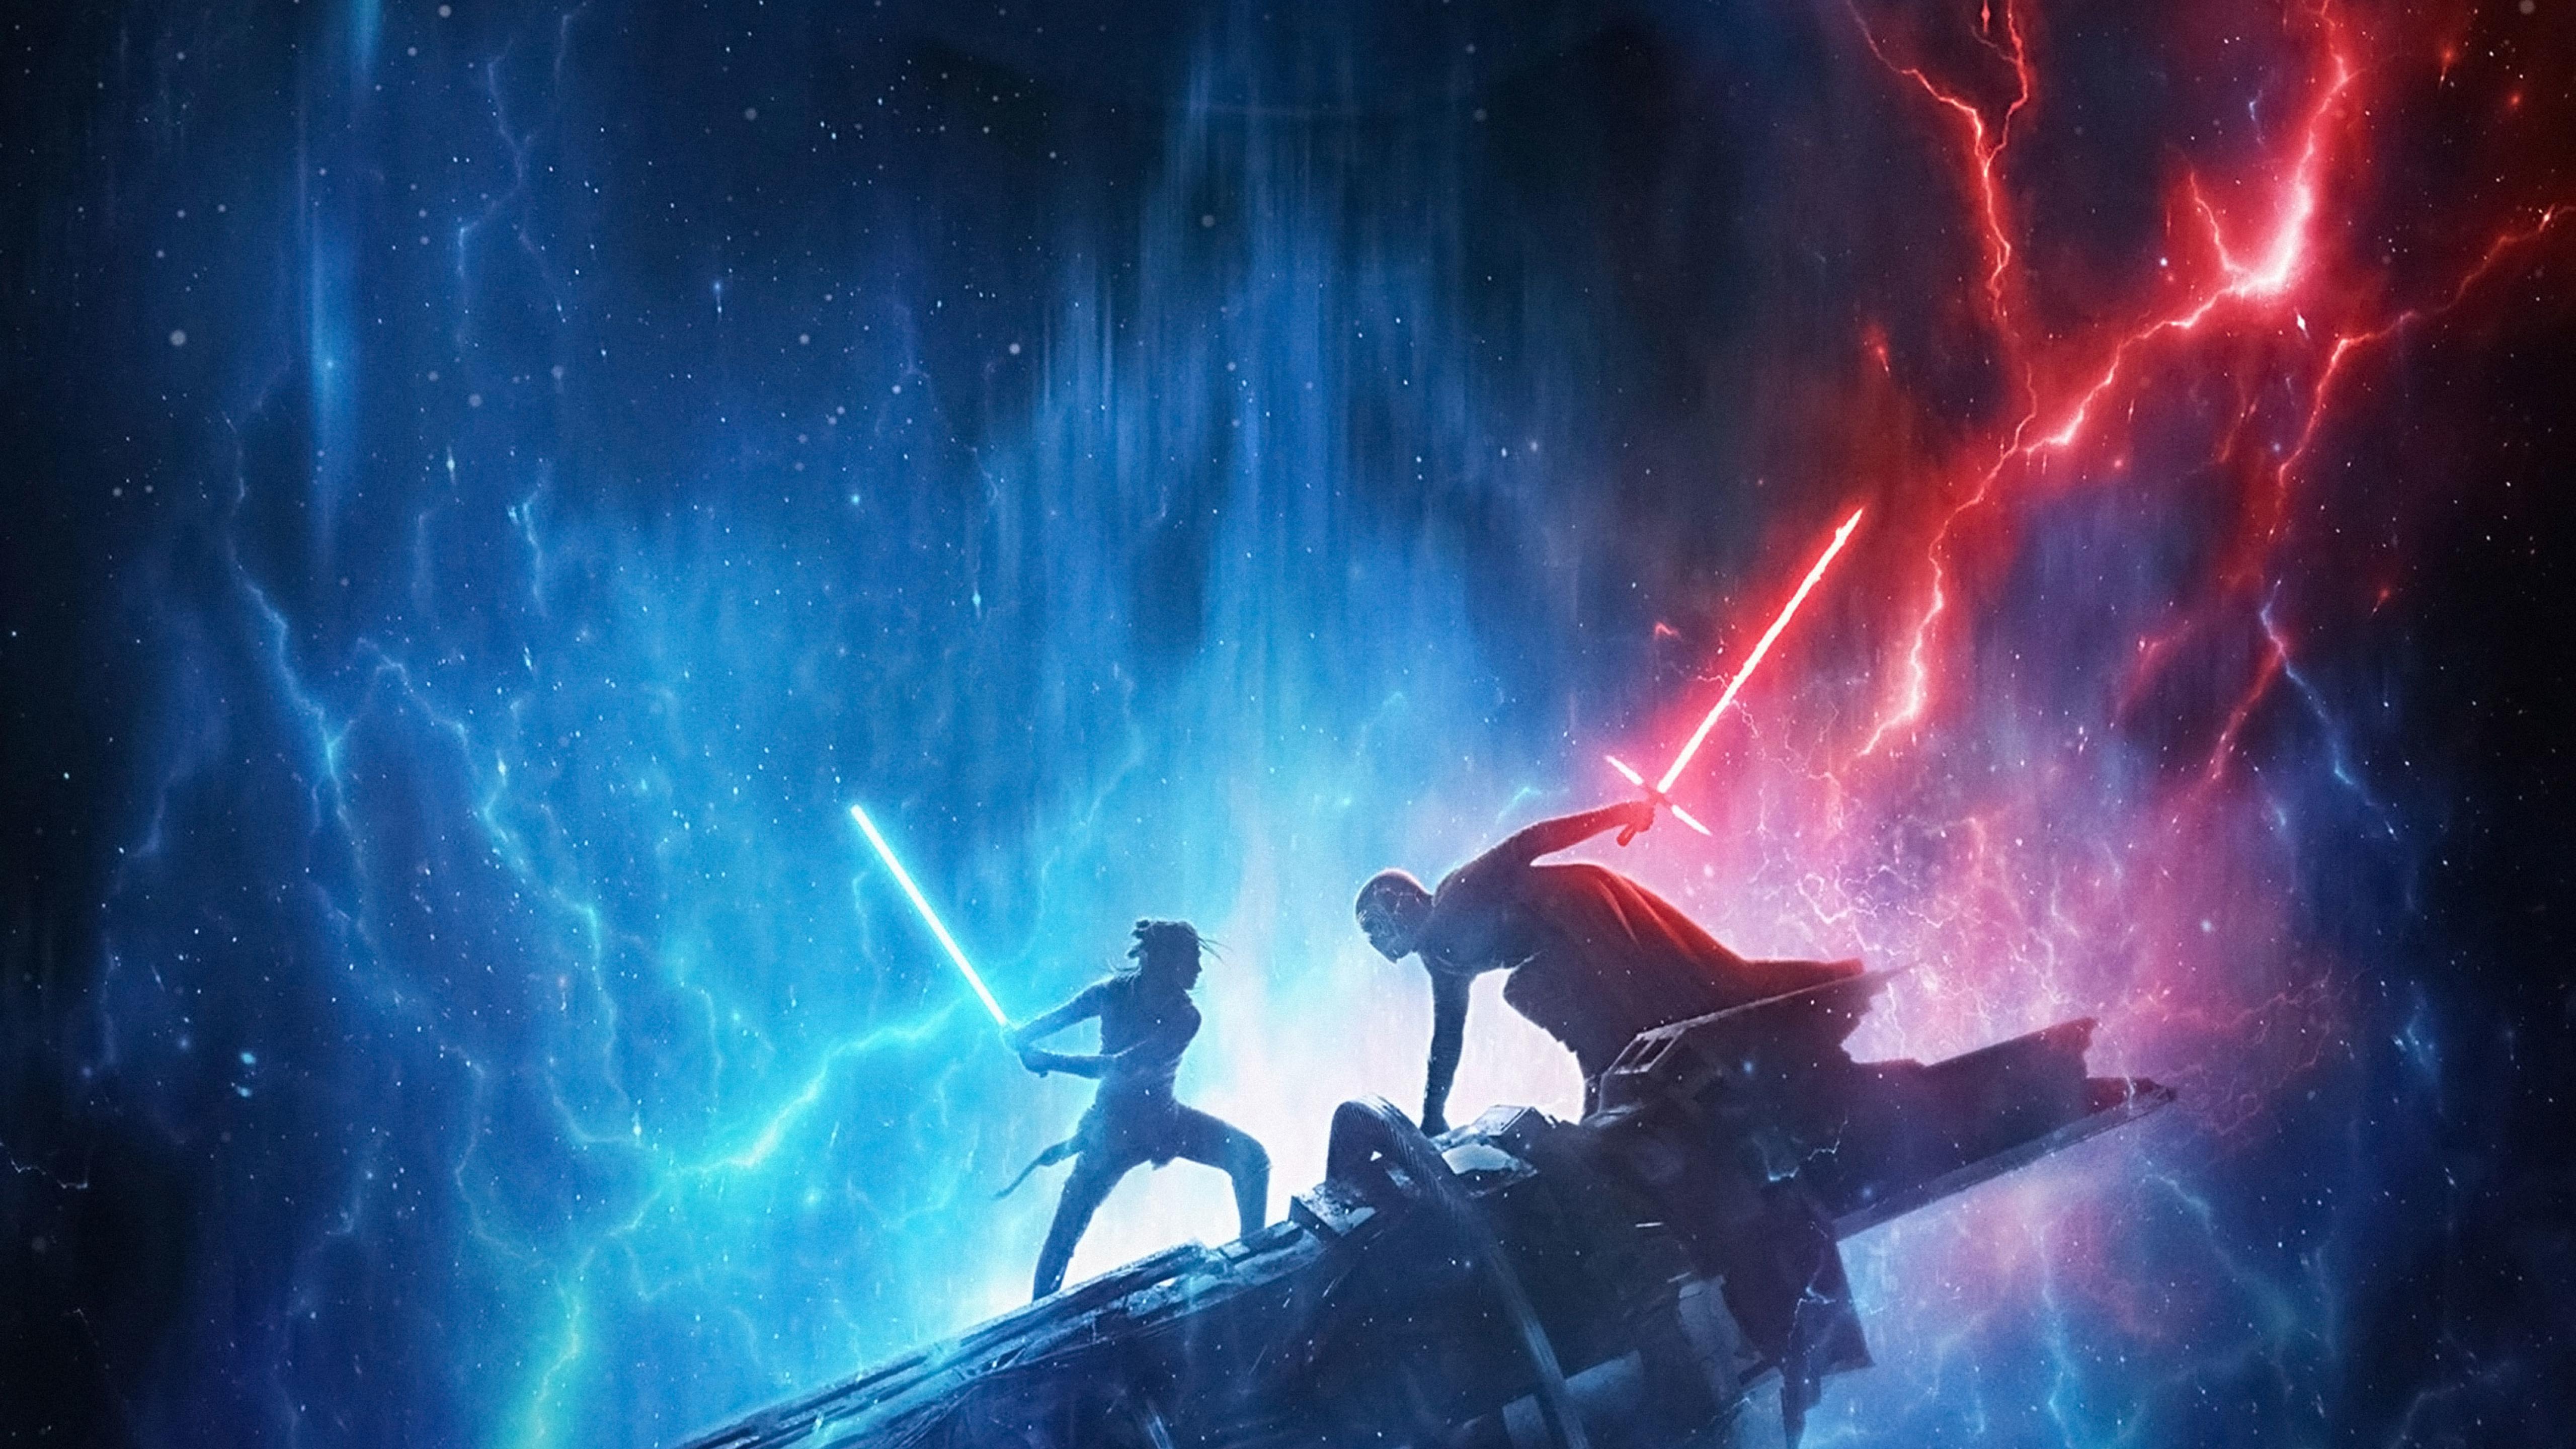 5120x2880 Star Wars The Rise Of Skywalker 5k Wallpaper Hd Movies